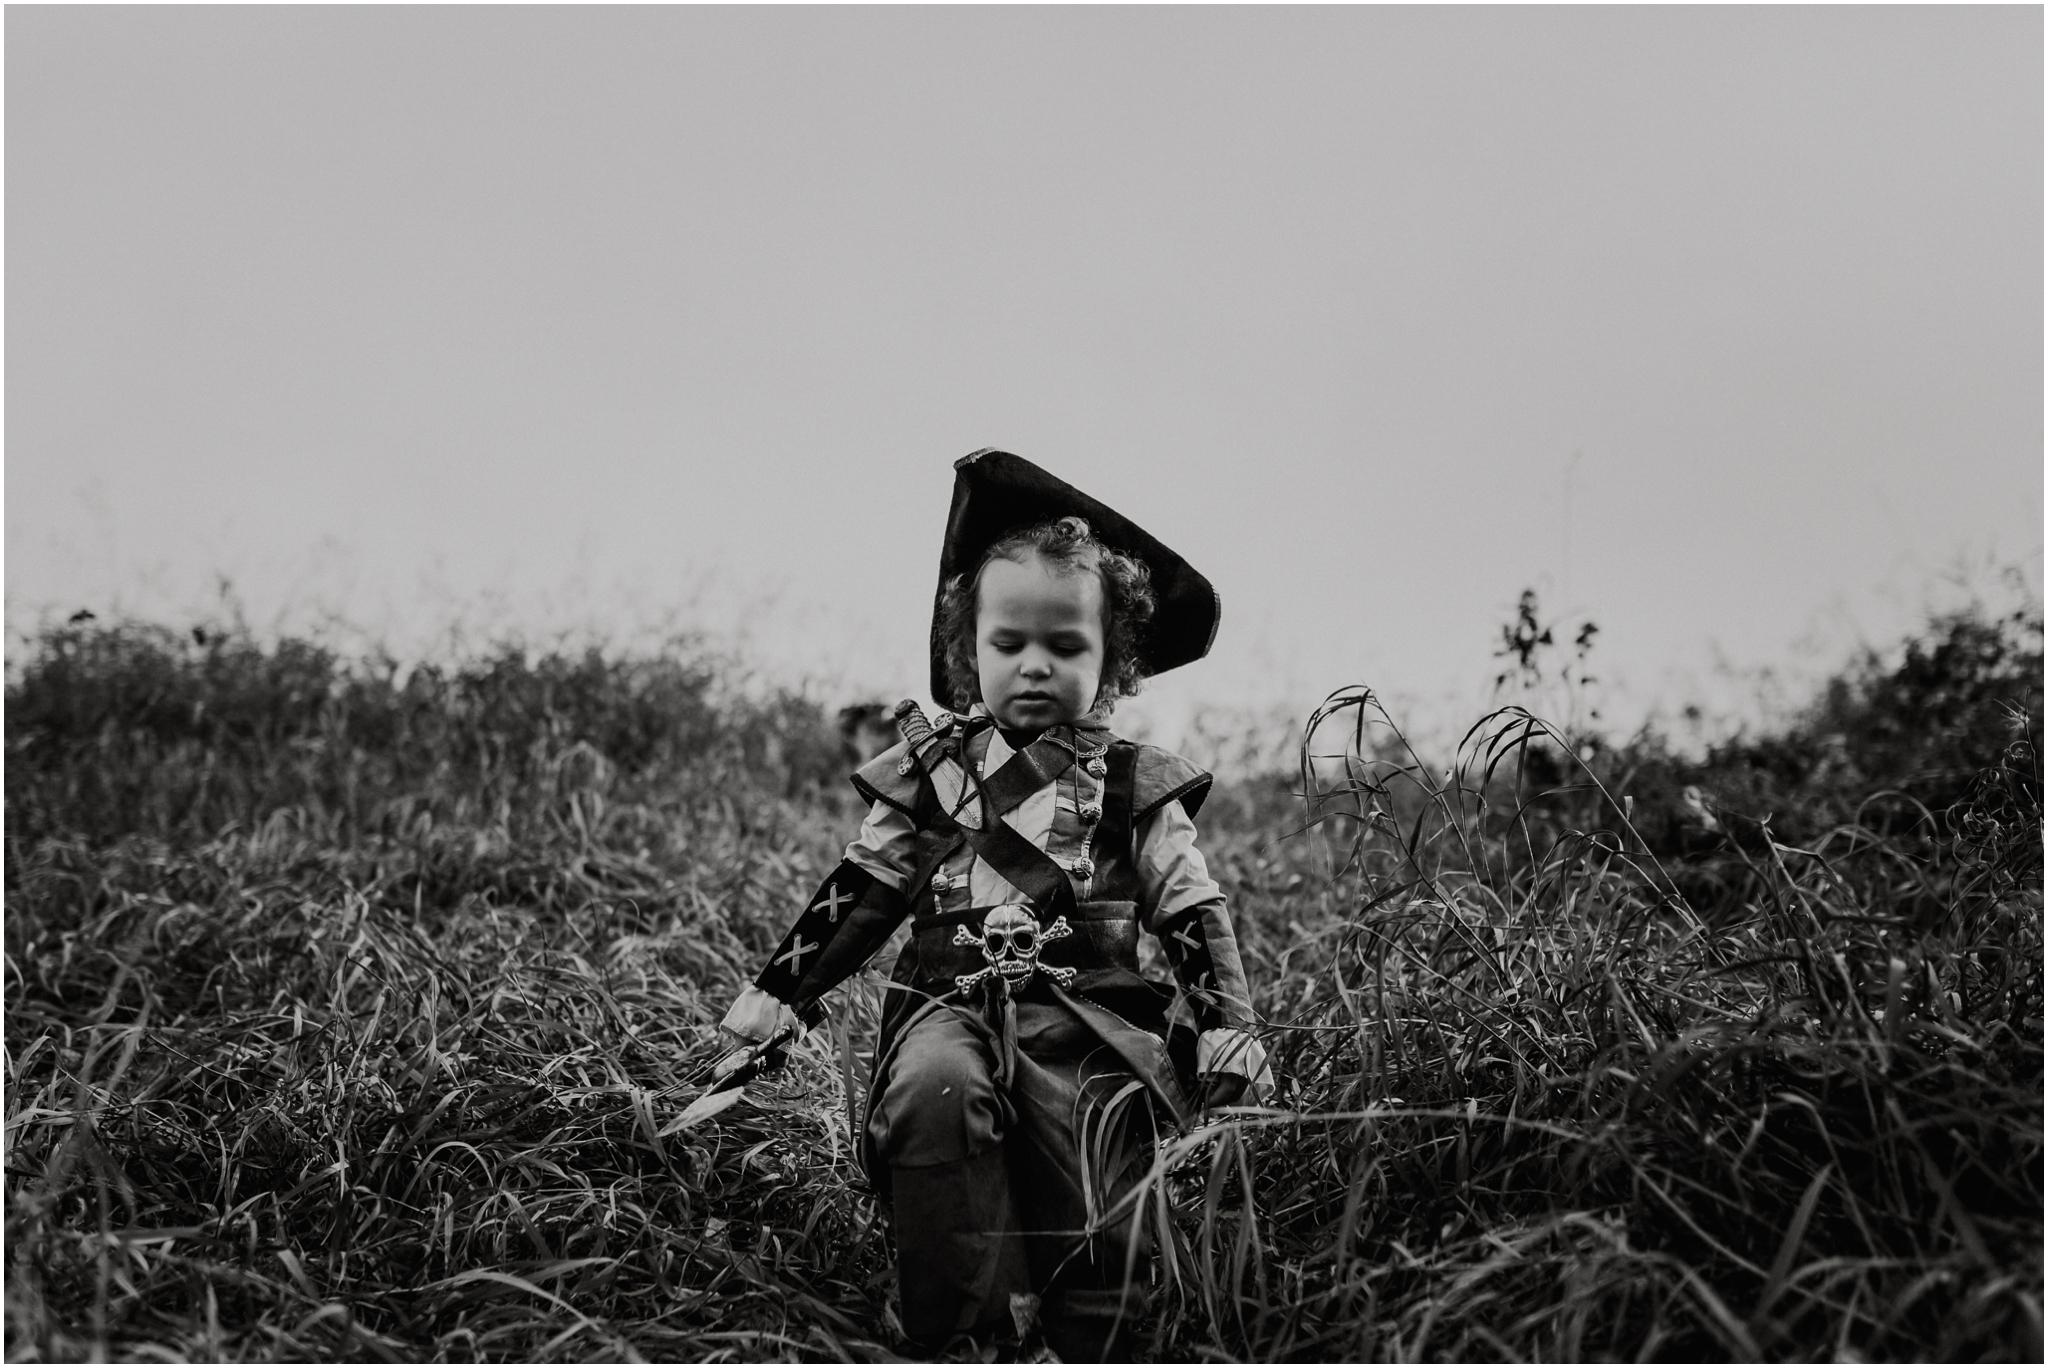 Edmonton Child Photographer - Pirate Costume - Halloween Costume